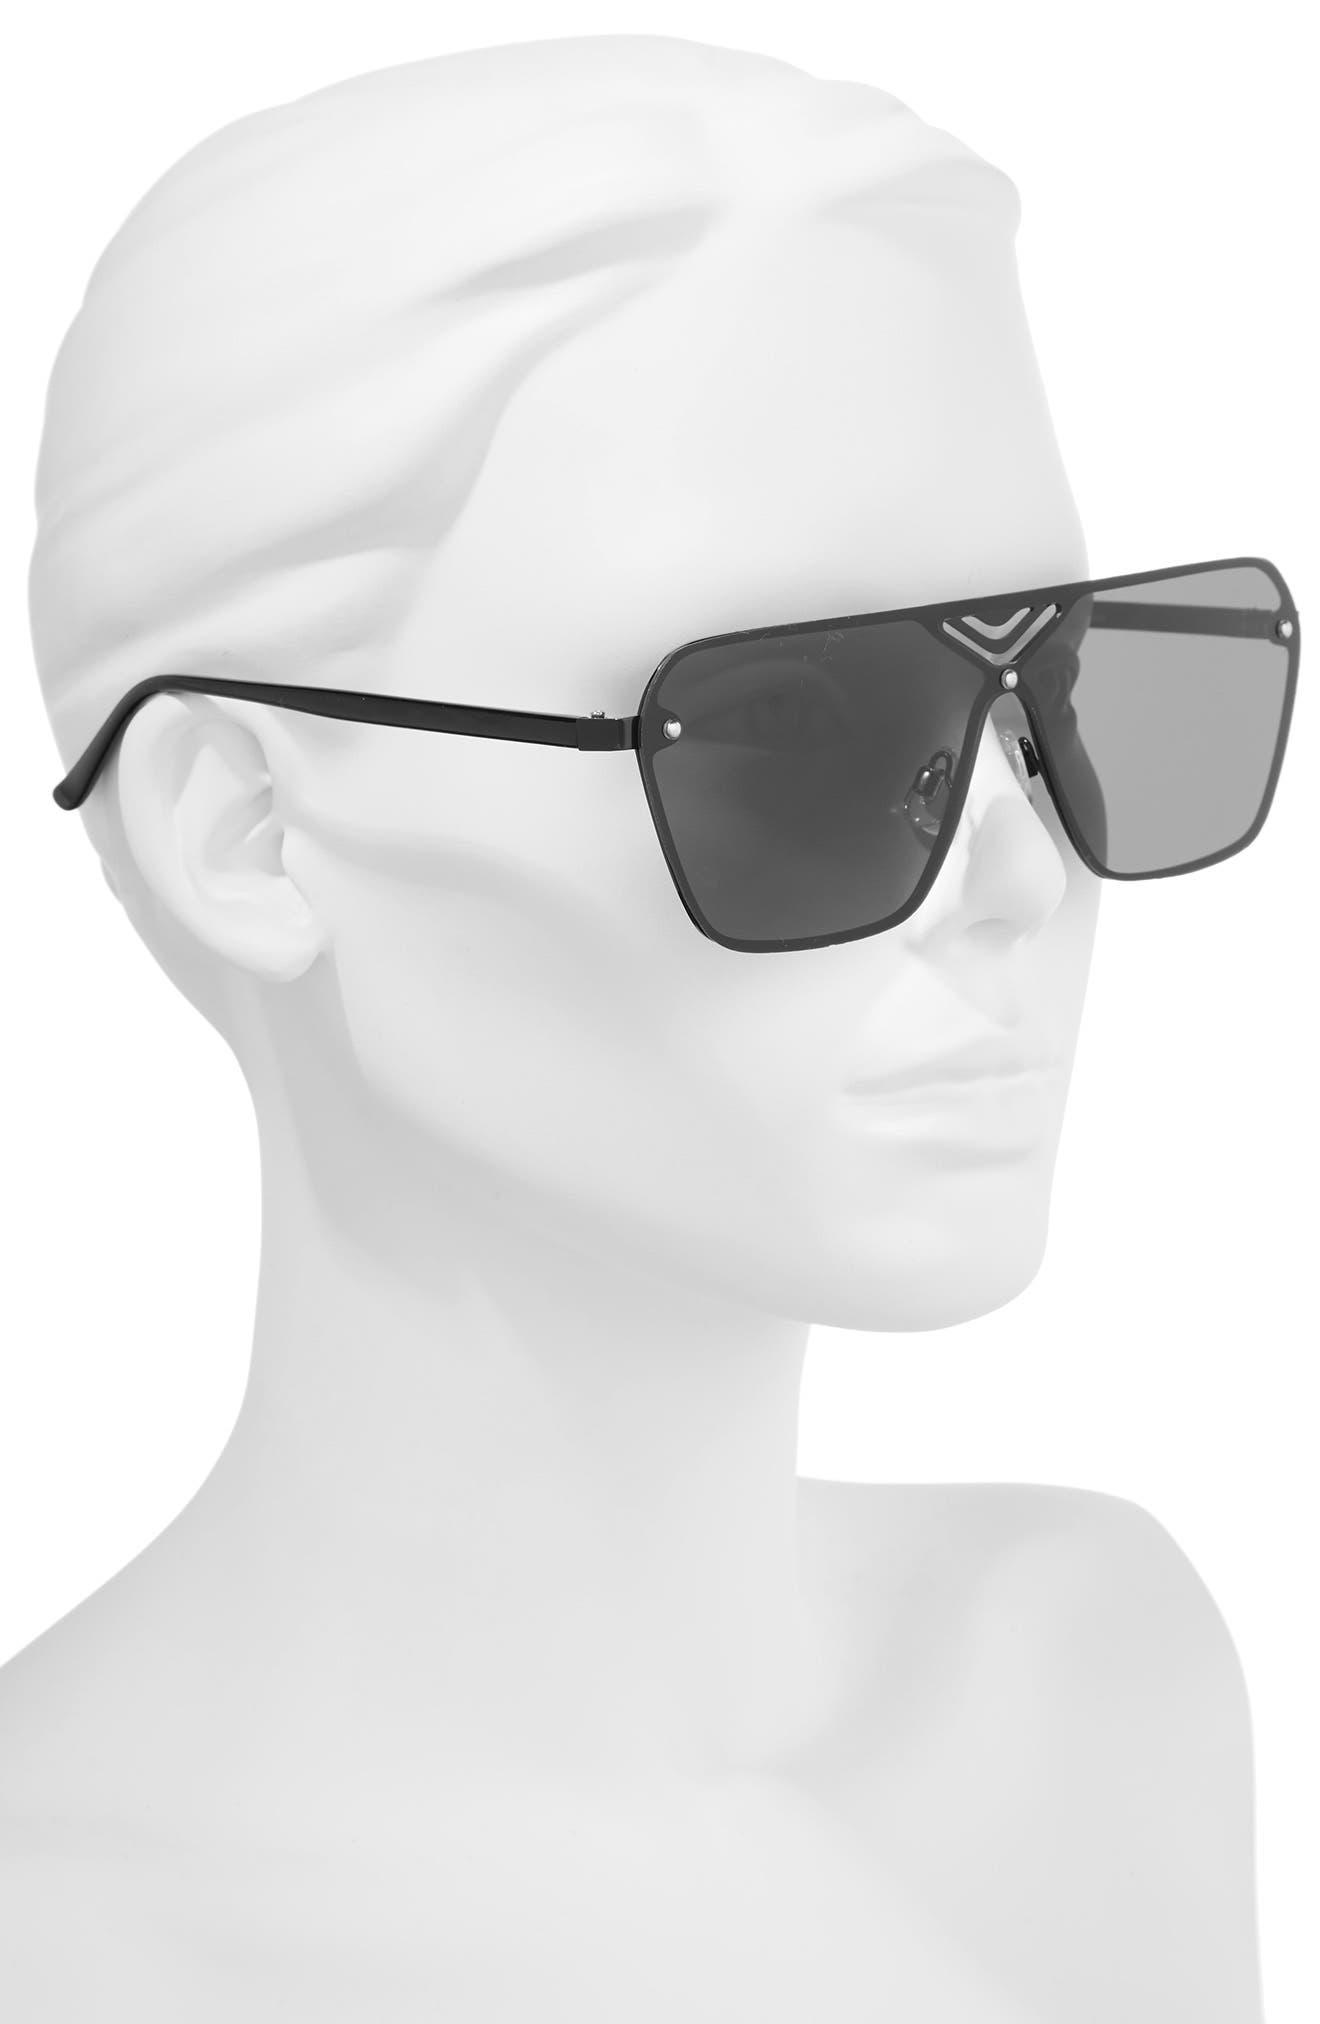 70mm Cutout Shield Sunglasses,                             Alternate thumbnail 2, color,                             001